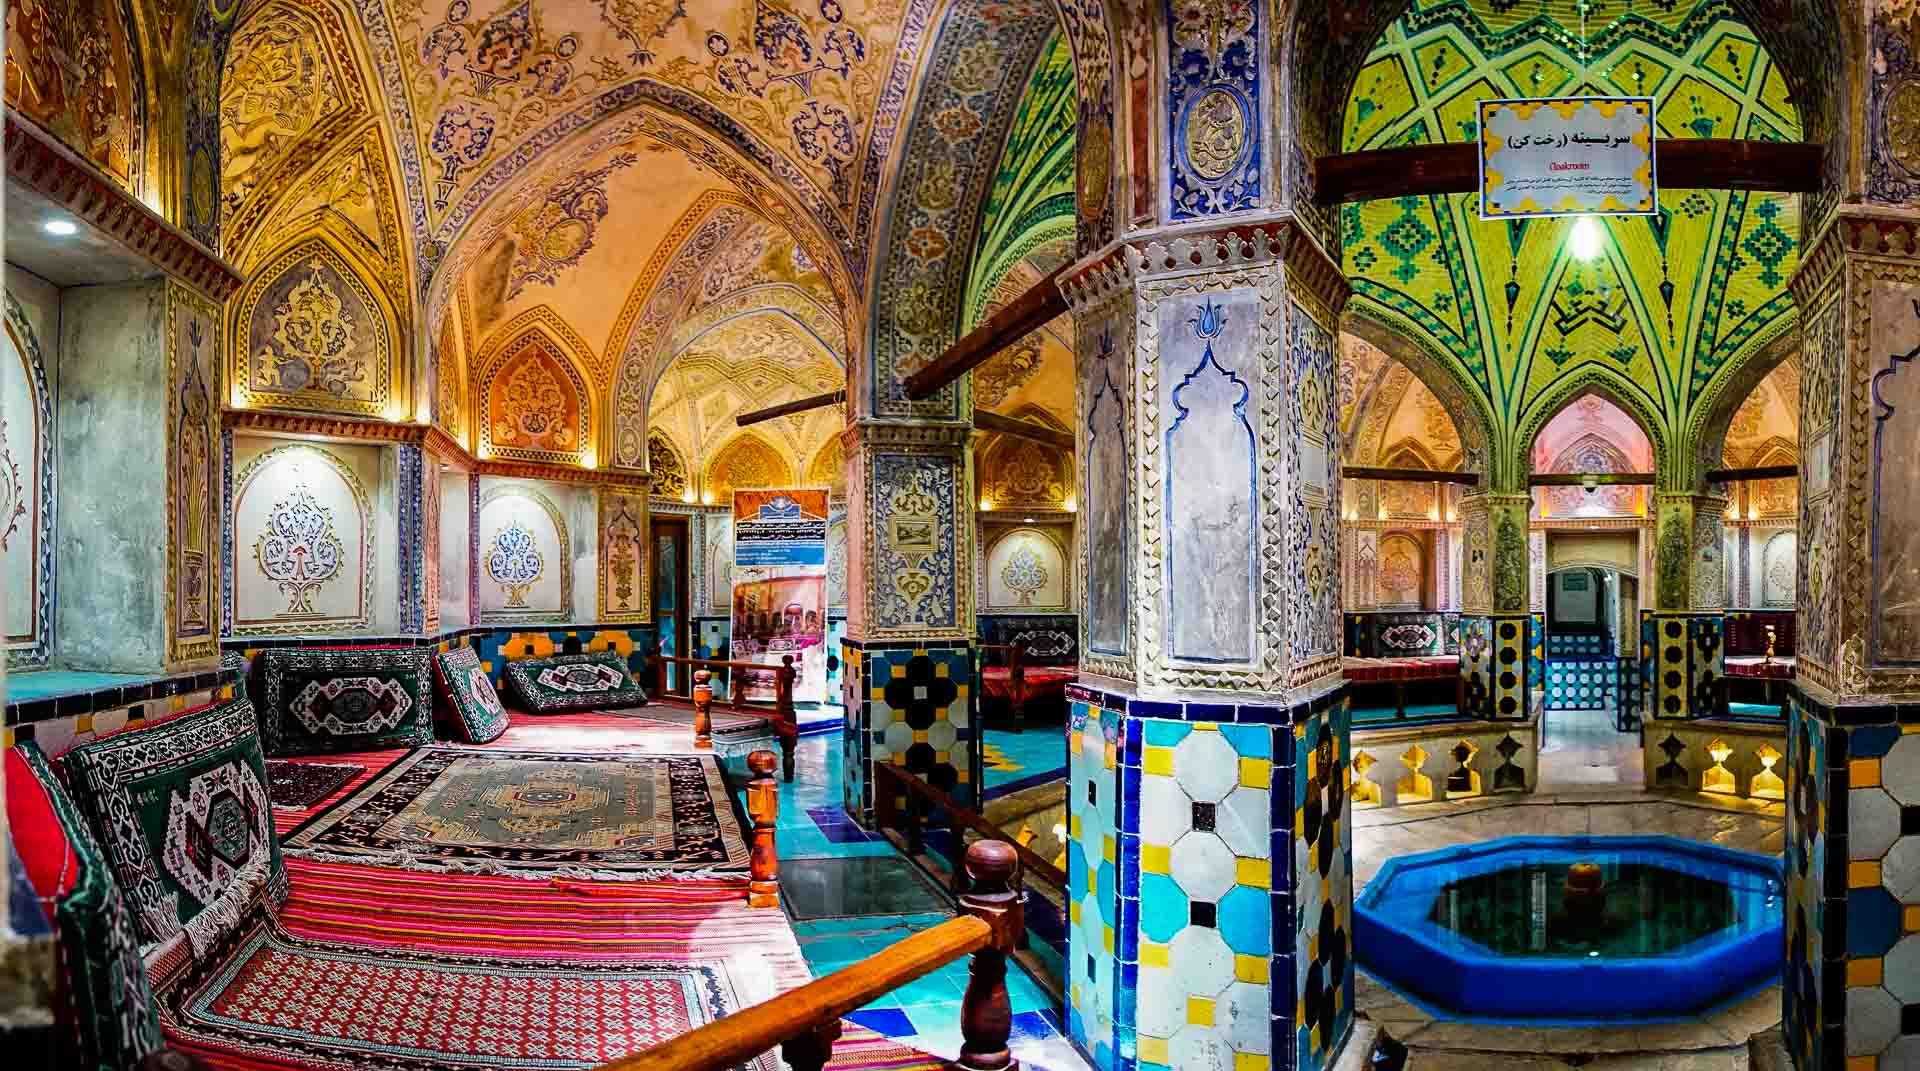 Sultan Amir Ahmad Bathhouse main room, kashan, iran, pescart, photo blog, travel blog, blog, photo travel blog, enrico pescantini, pescantini